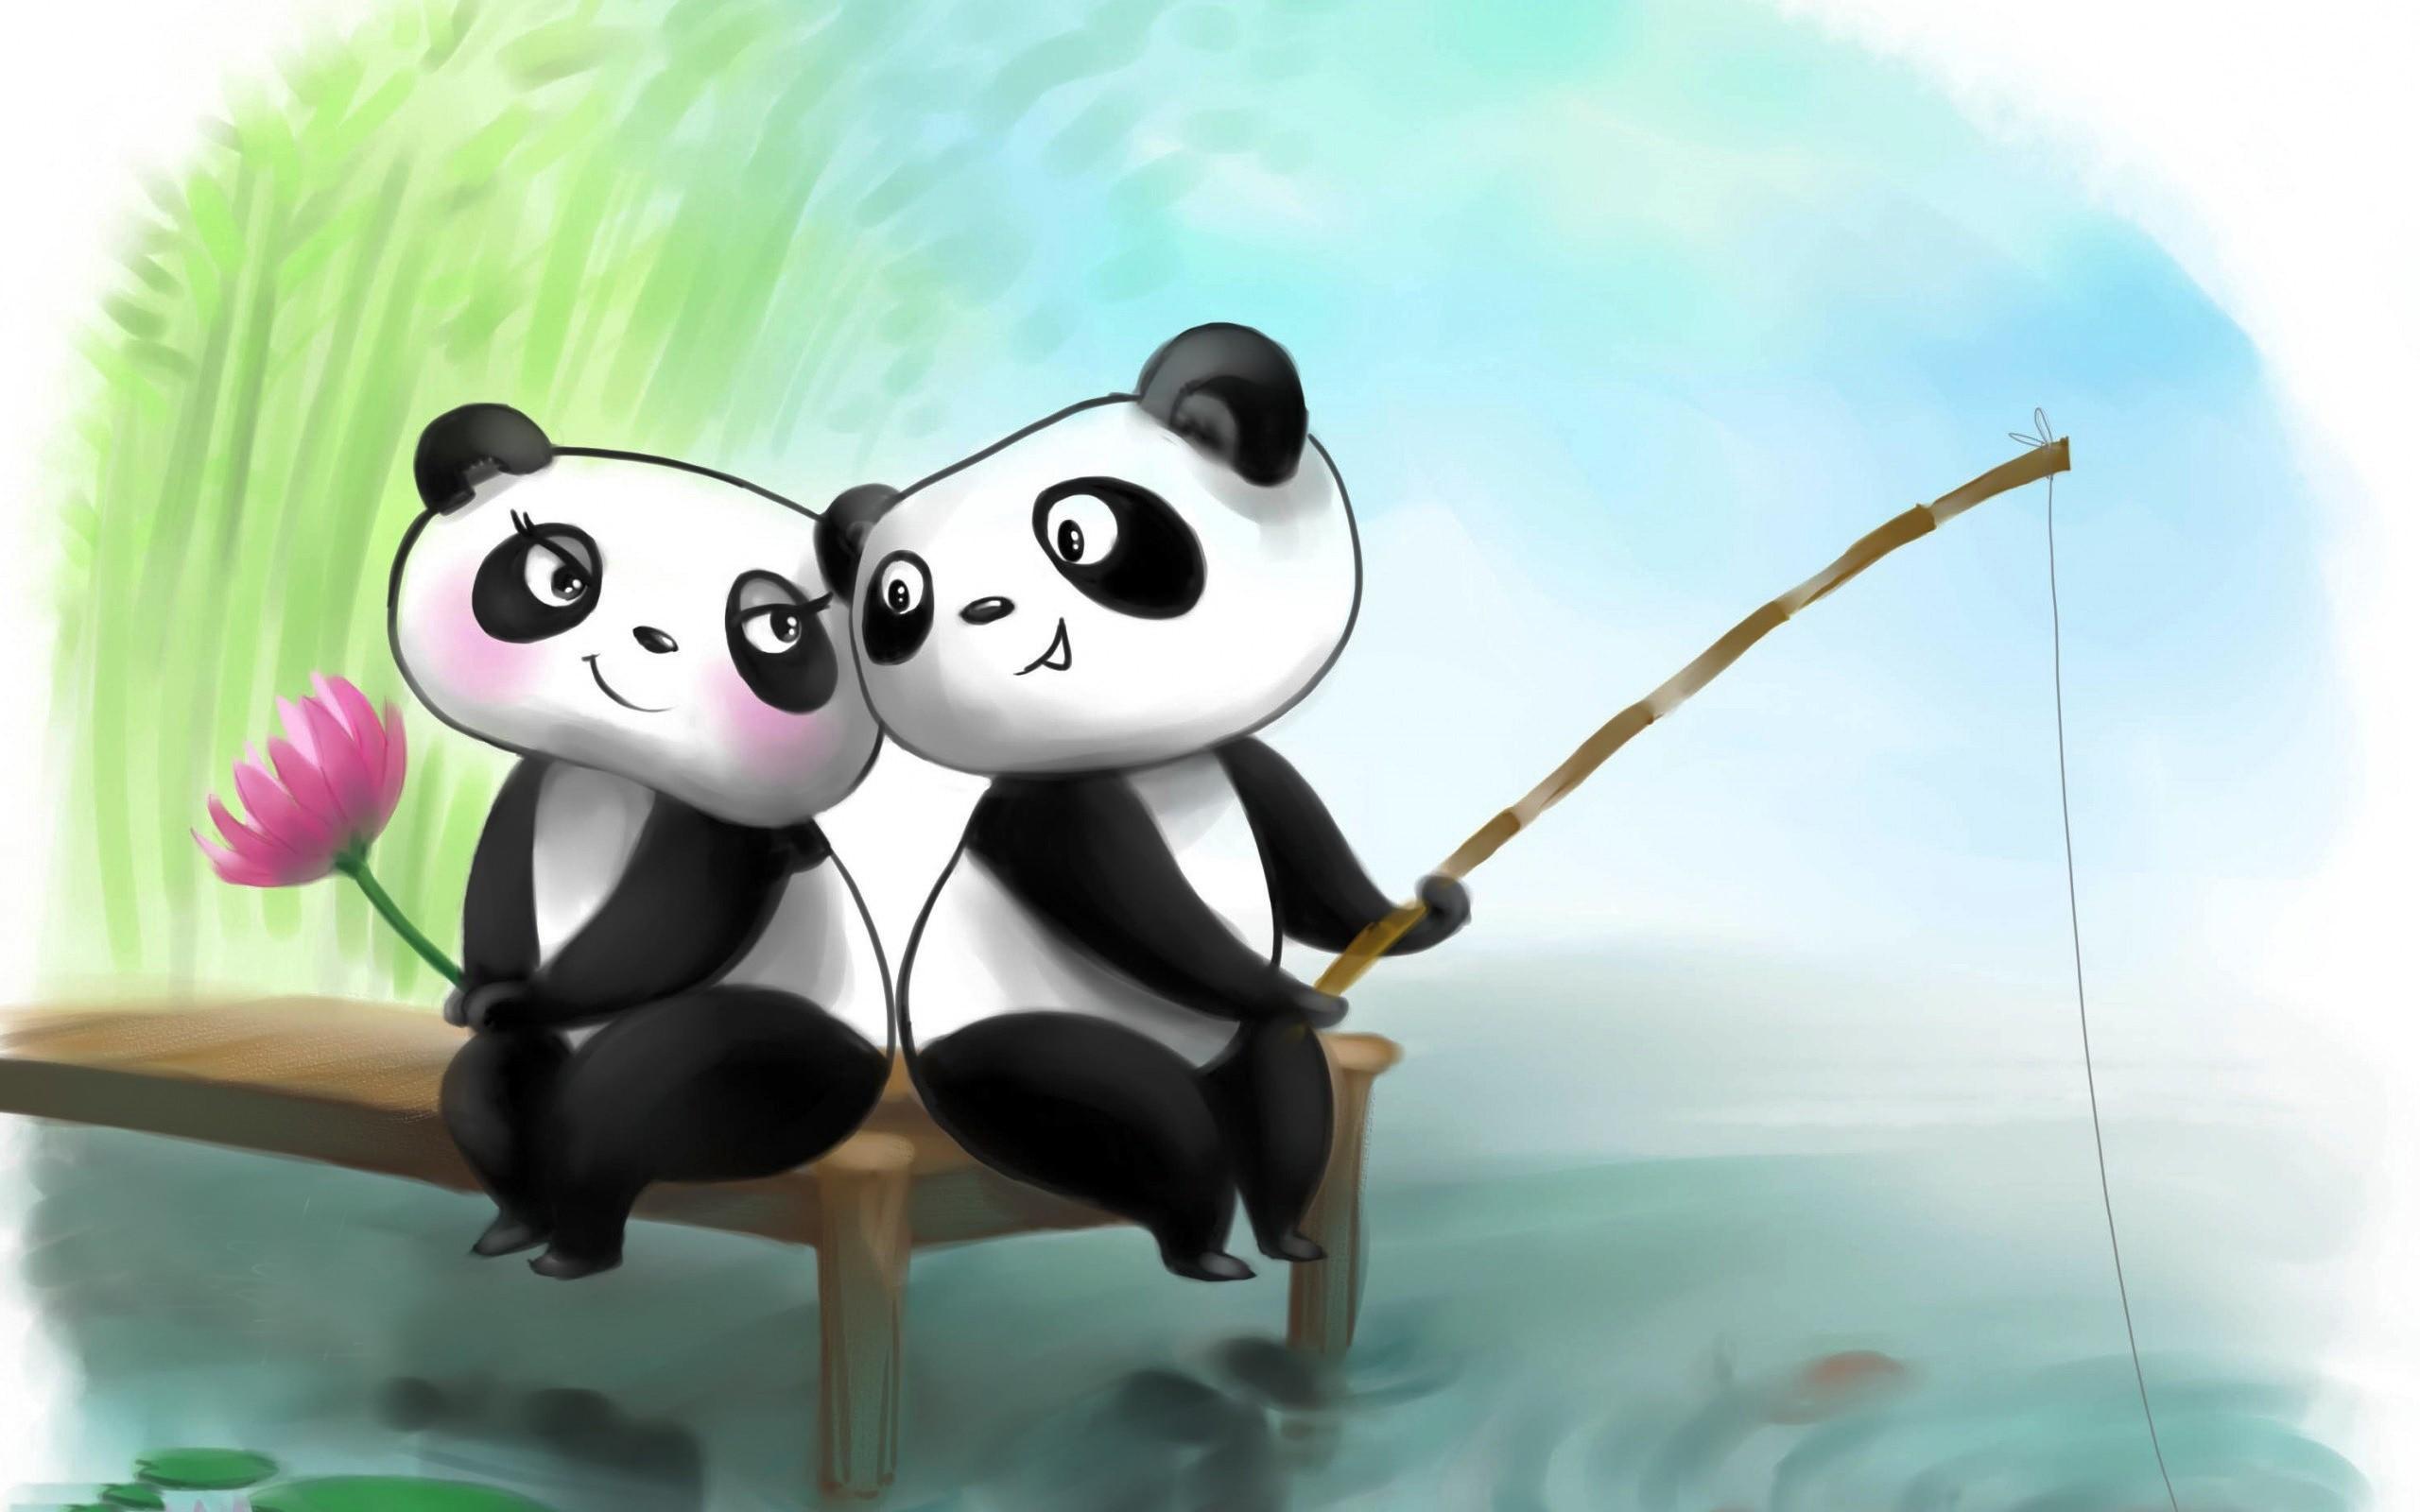 Res: 2560x1600, Romantic-panda-couple-HD-wallpaper-81129712.jpg